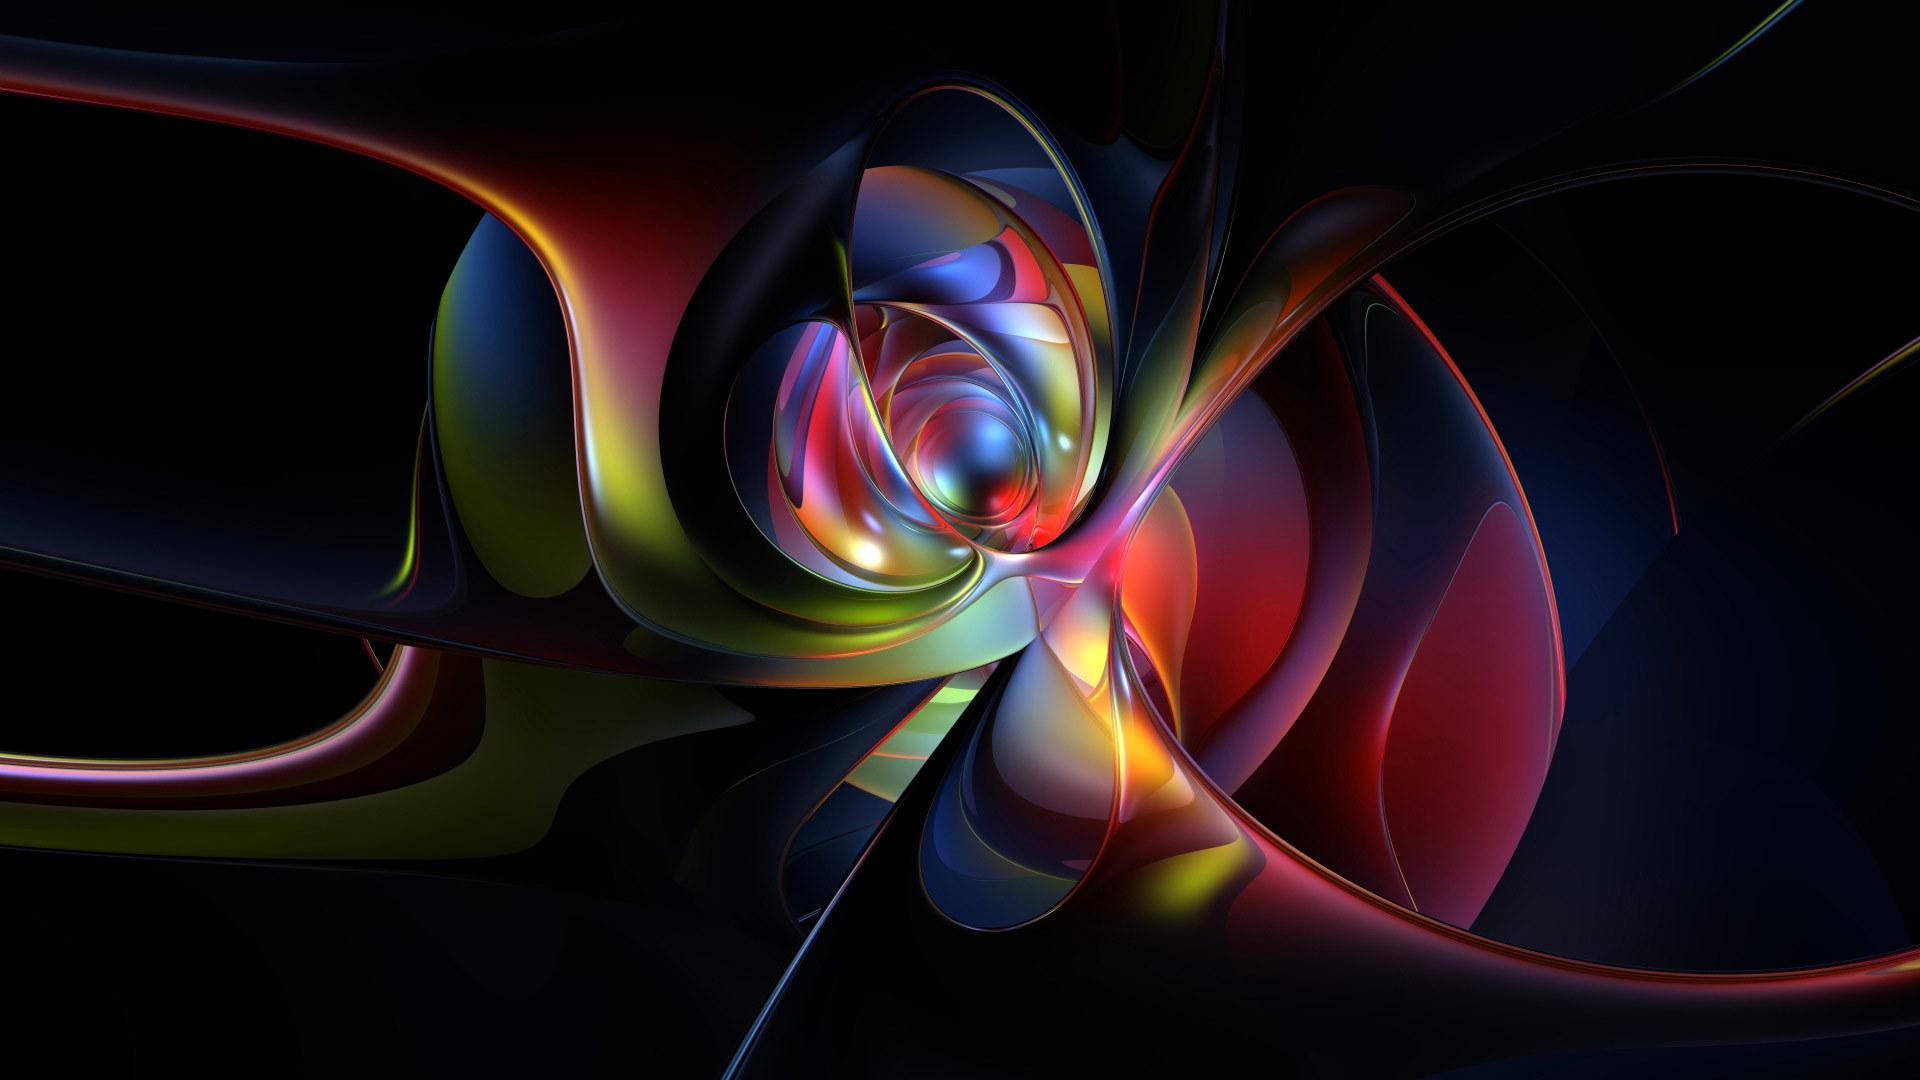 fond wallpaper,fractal art,light,graphic design,art,design